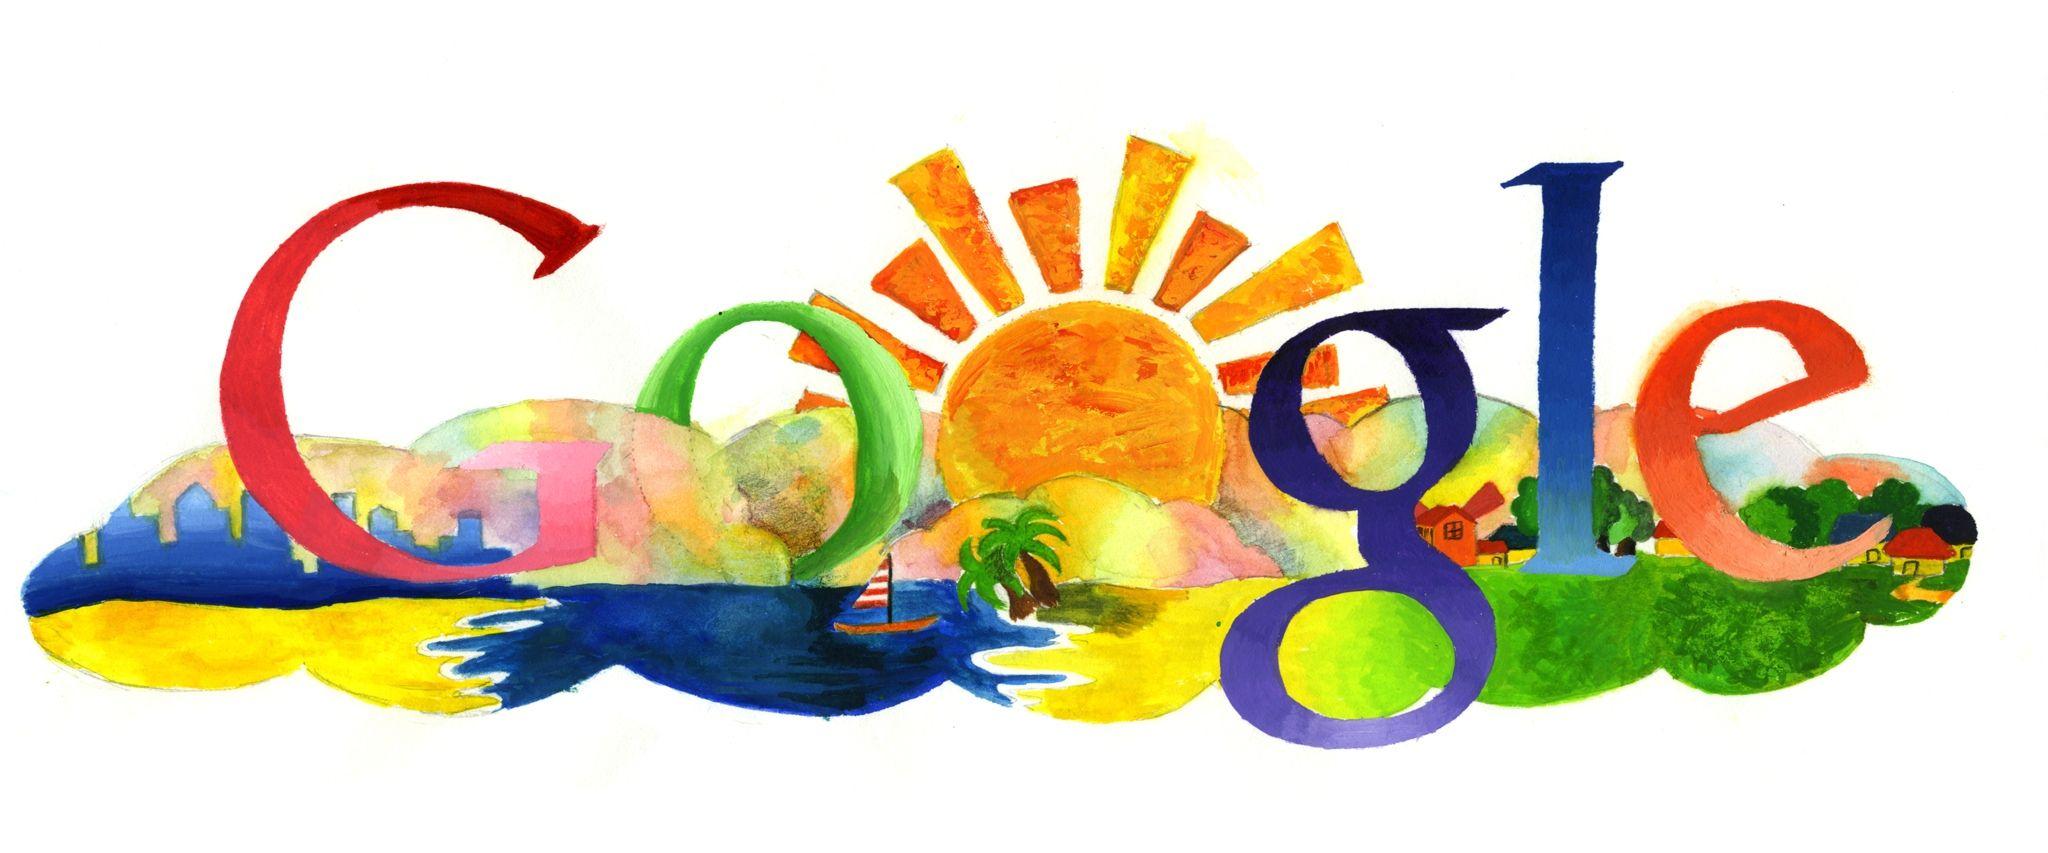 Google's Doodle 4 Google Logo Contest: Get Doodling, Kids | TIME.com | Google doodles, Doodle 4 google, Google logo